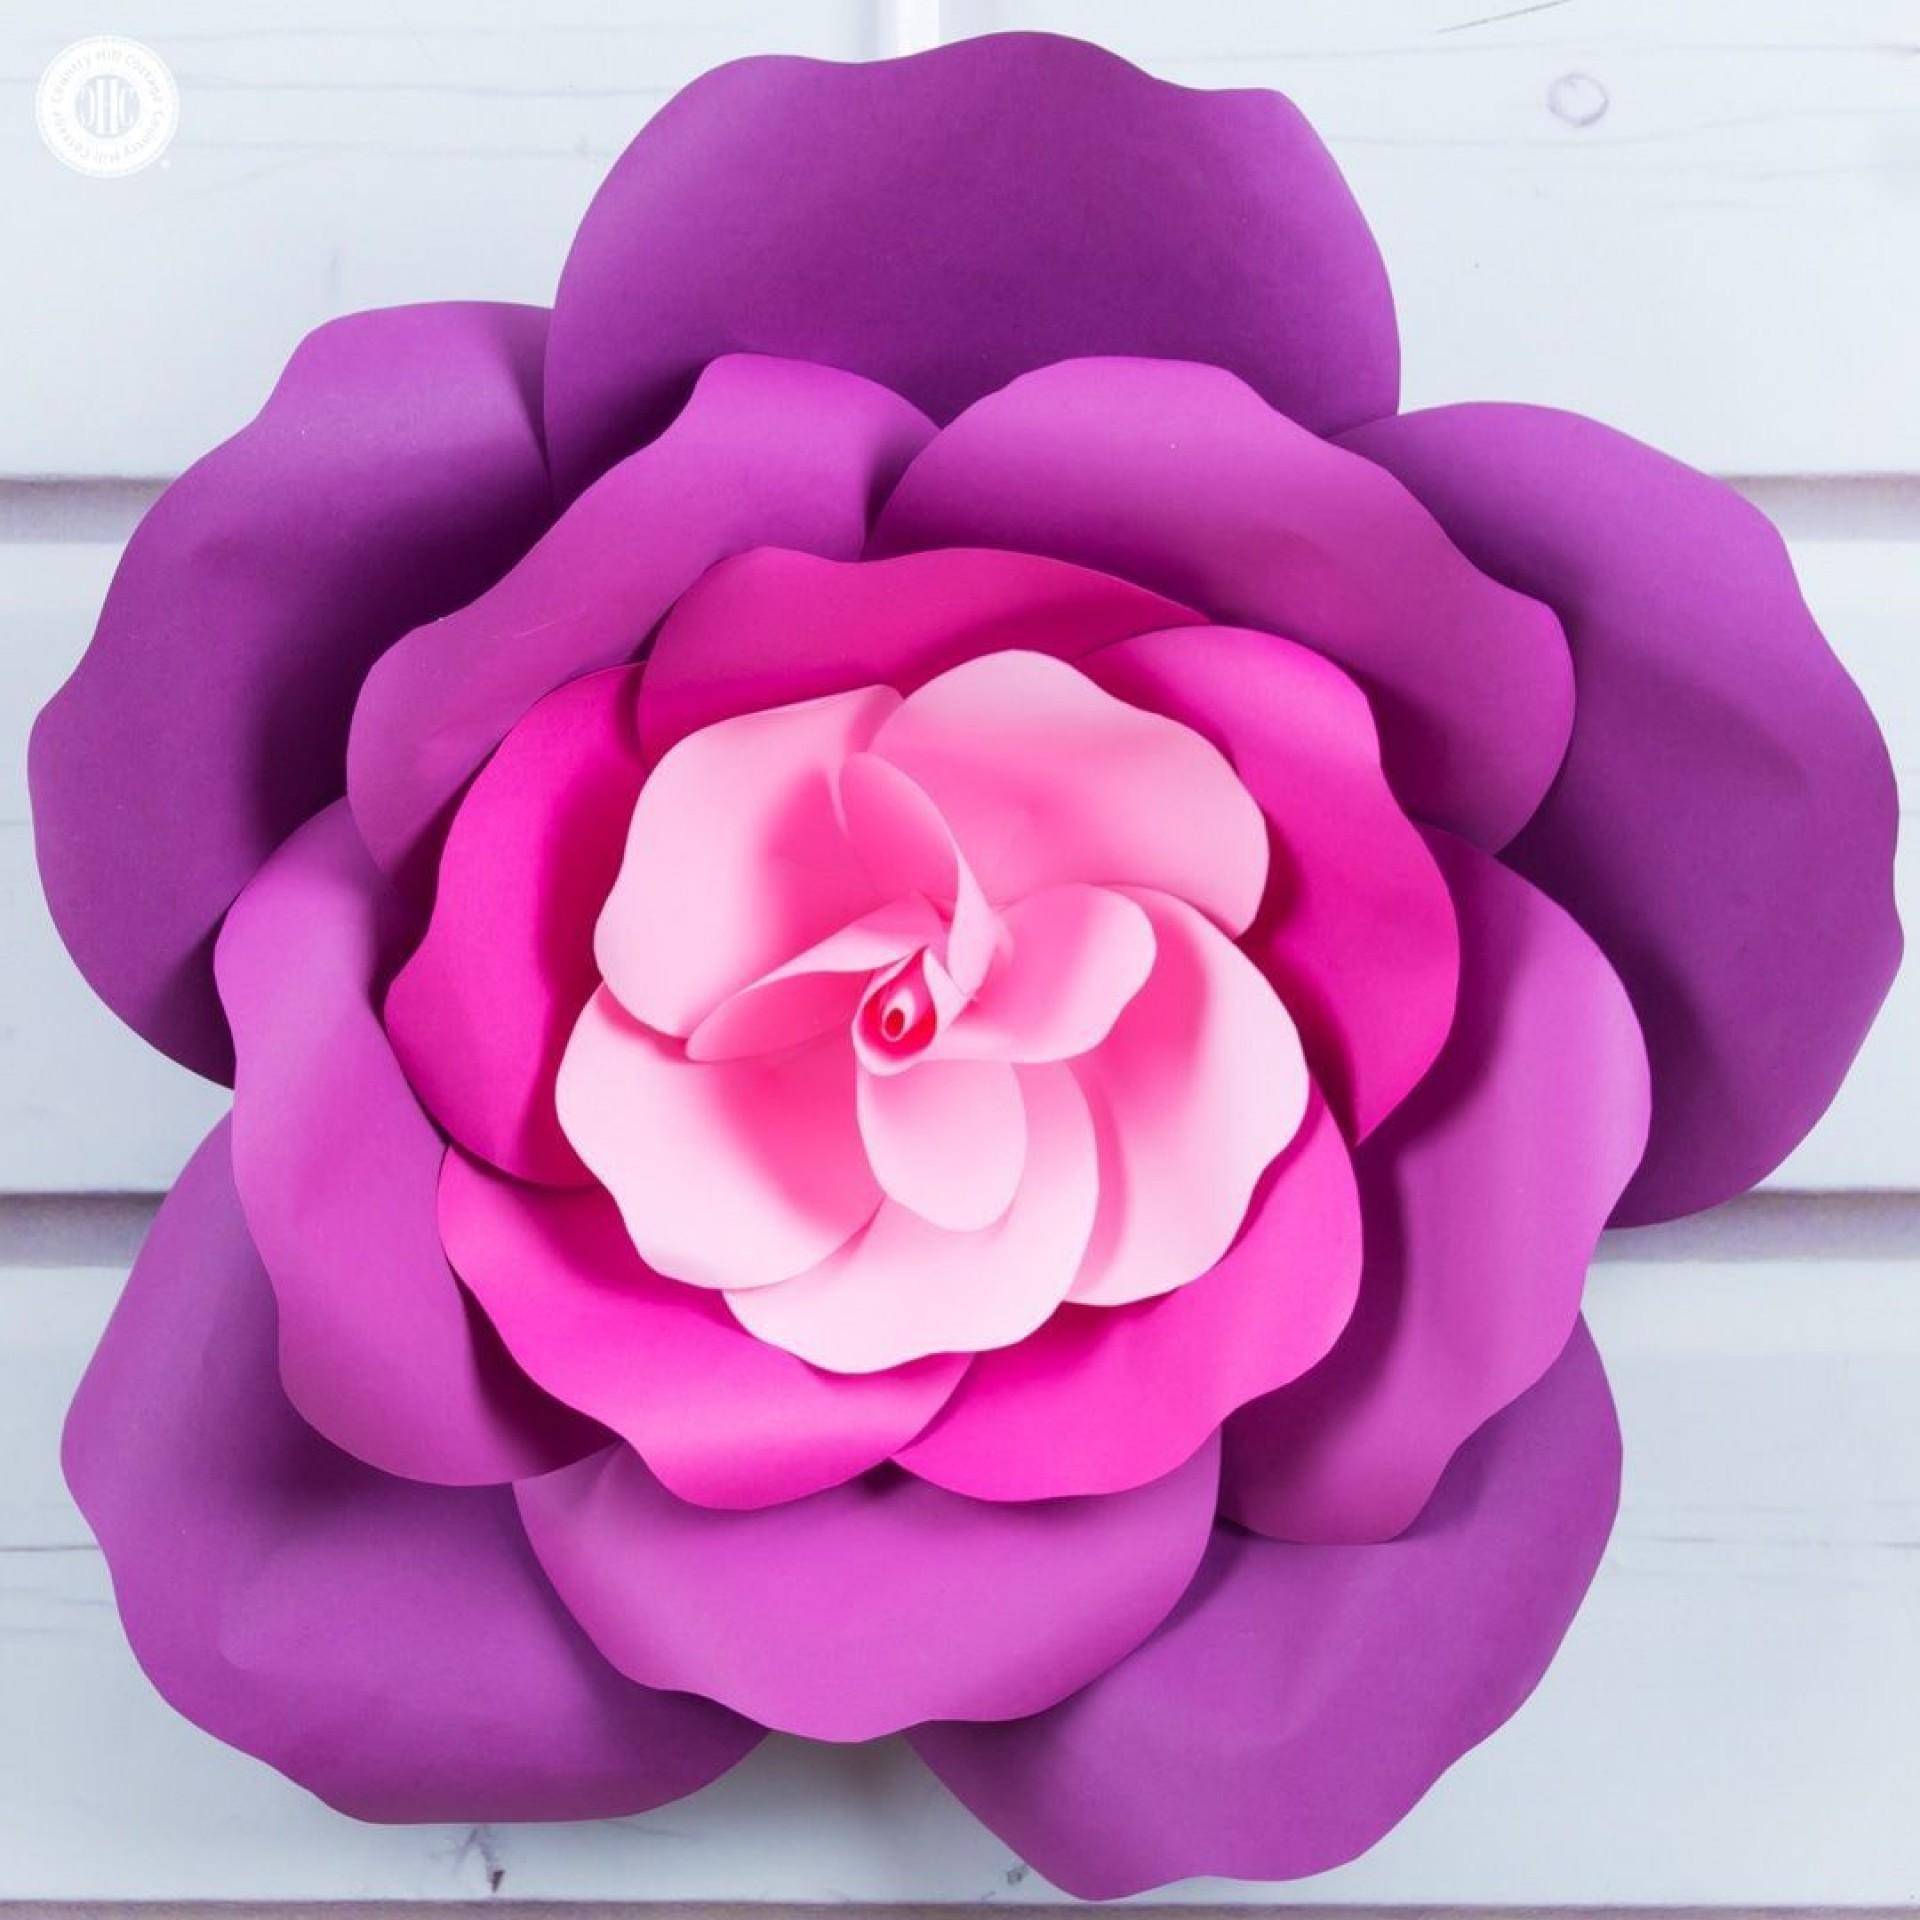 001 Astounding Large Rose Paper Flower Template Free Idea 1920